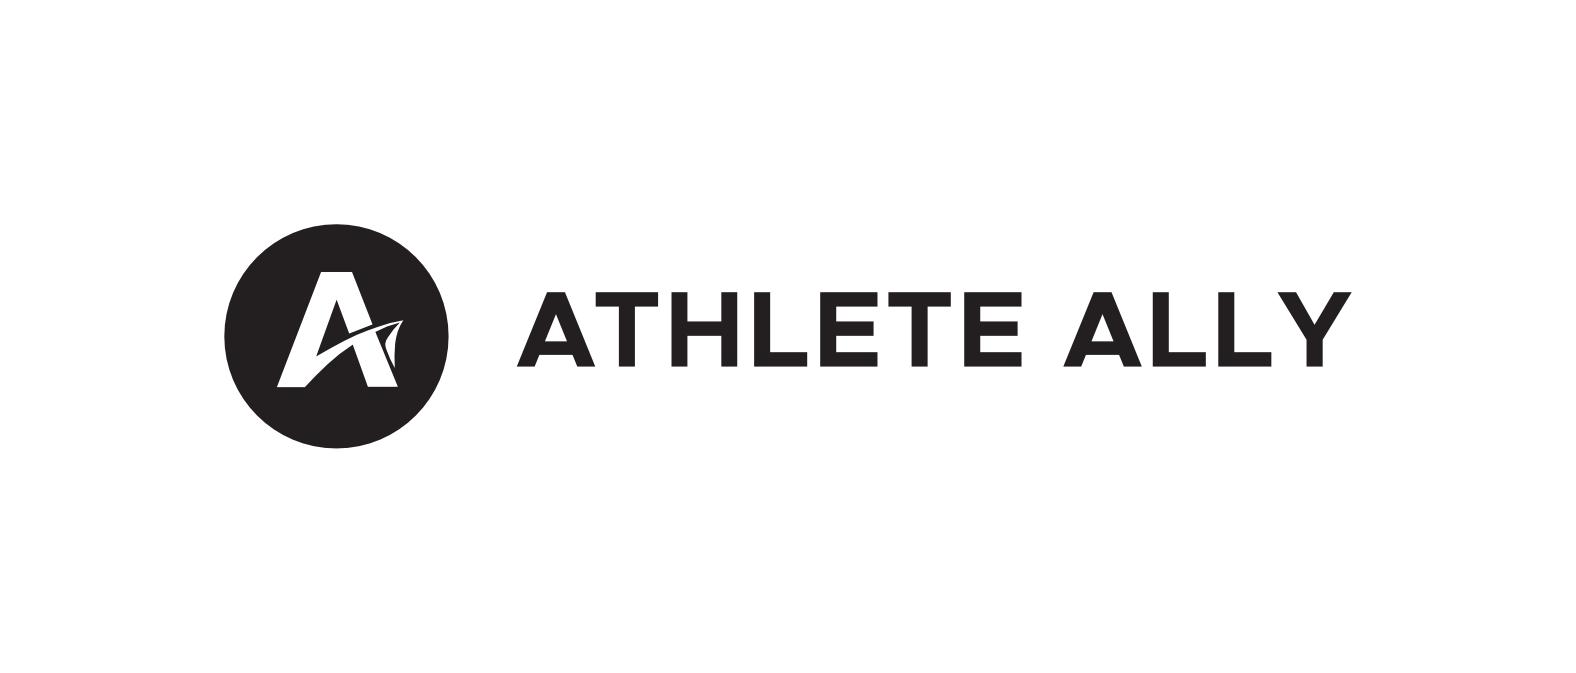 AthleteAlly-logo-horizontal-2018.png